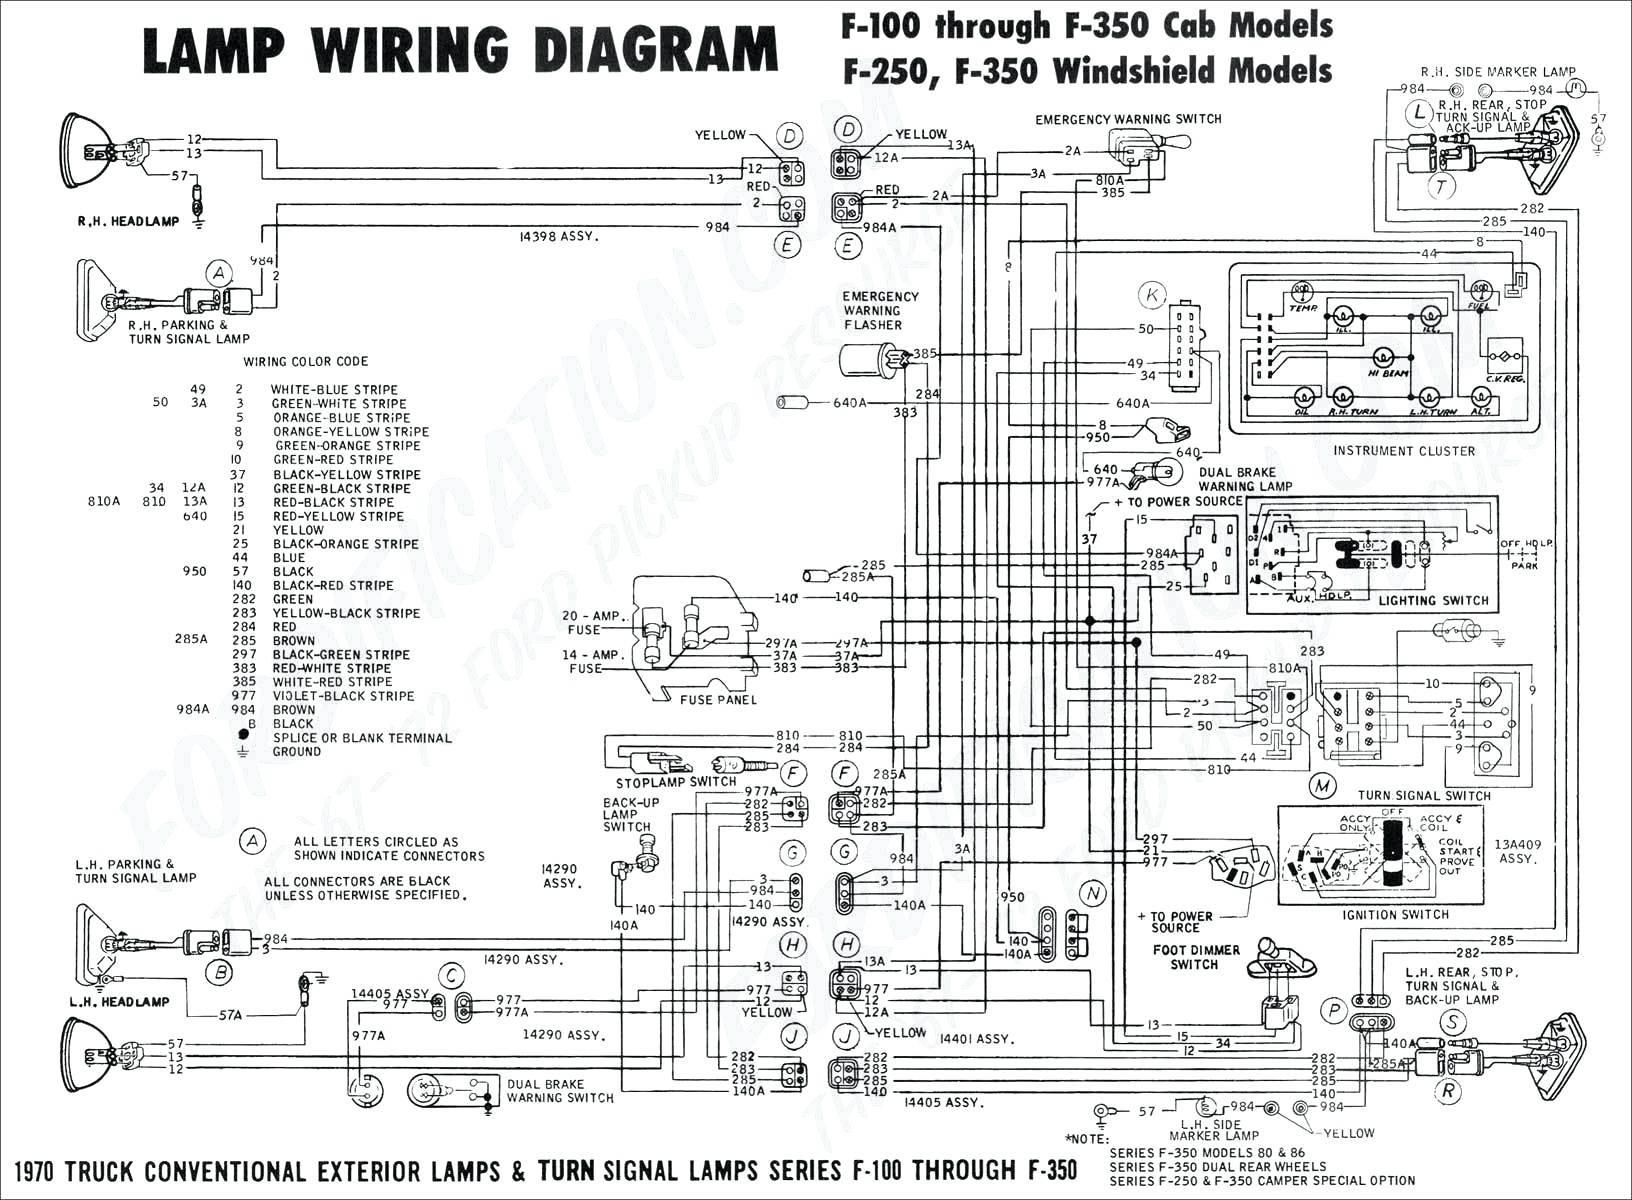 Ford Truck Steering Column Diagram 1973 1979 ford Truck